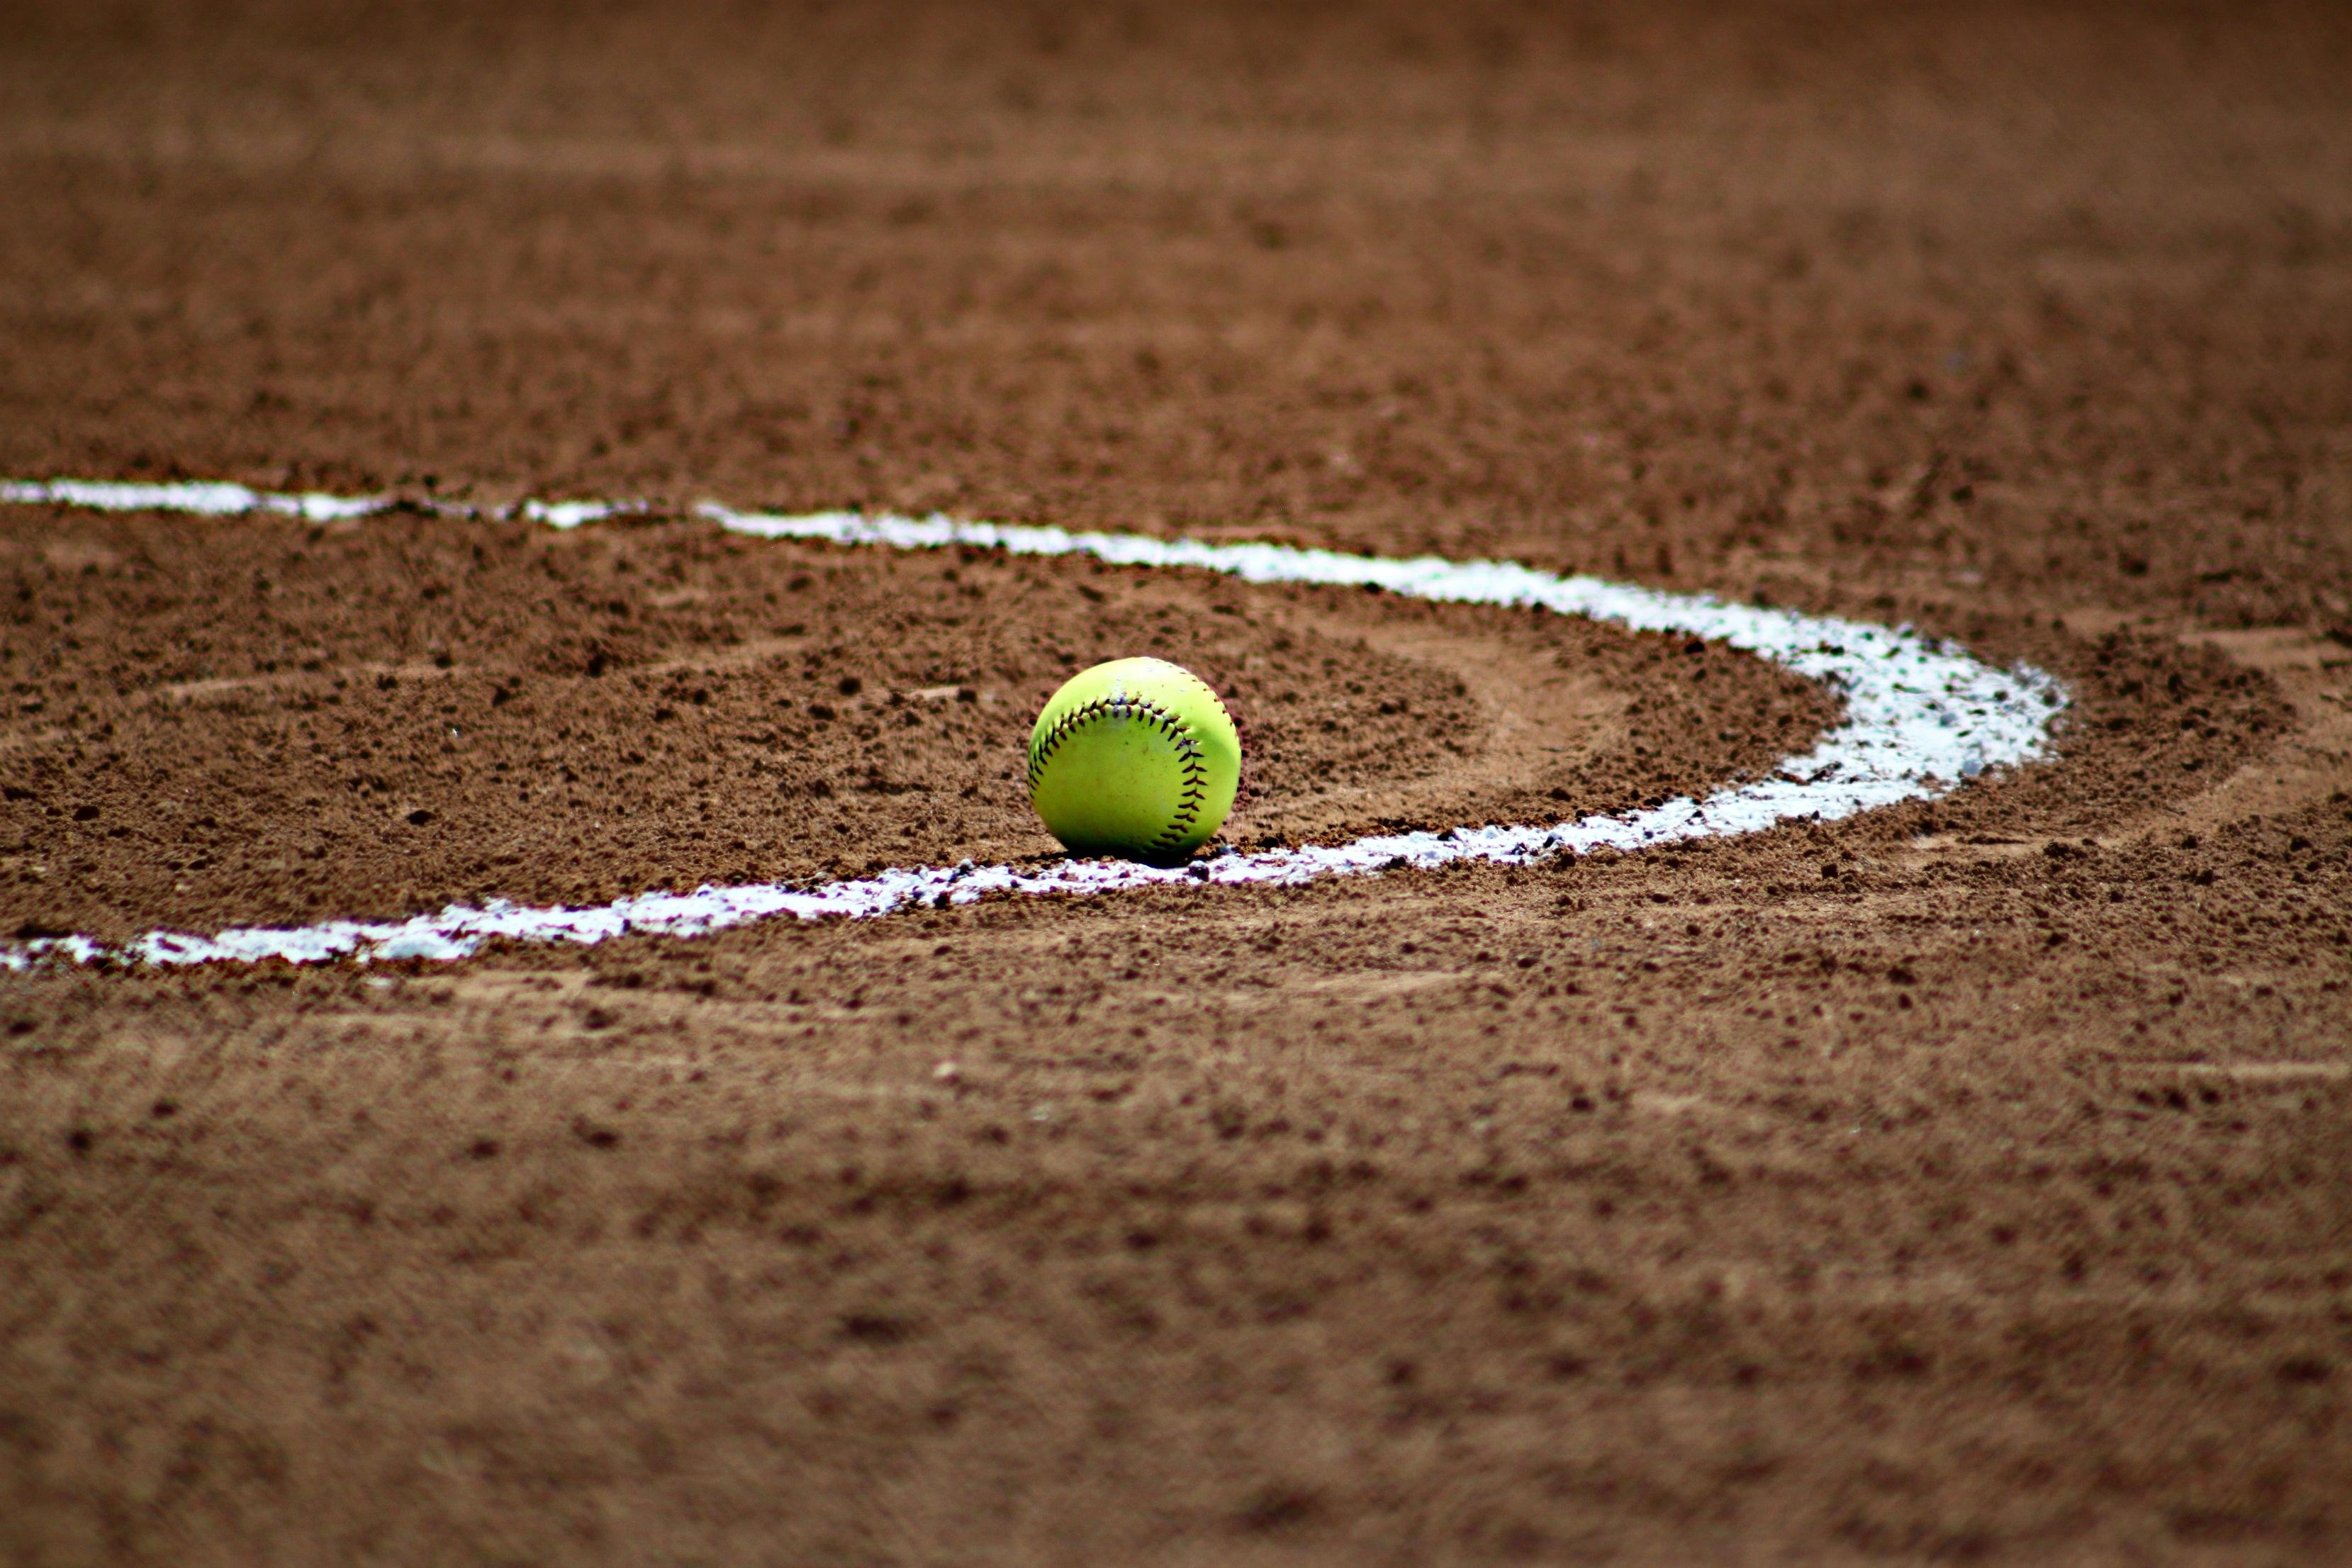 http://midwestspeedfastpitch.org/wp-content/uploads/2018/09/softball-372979.jpg